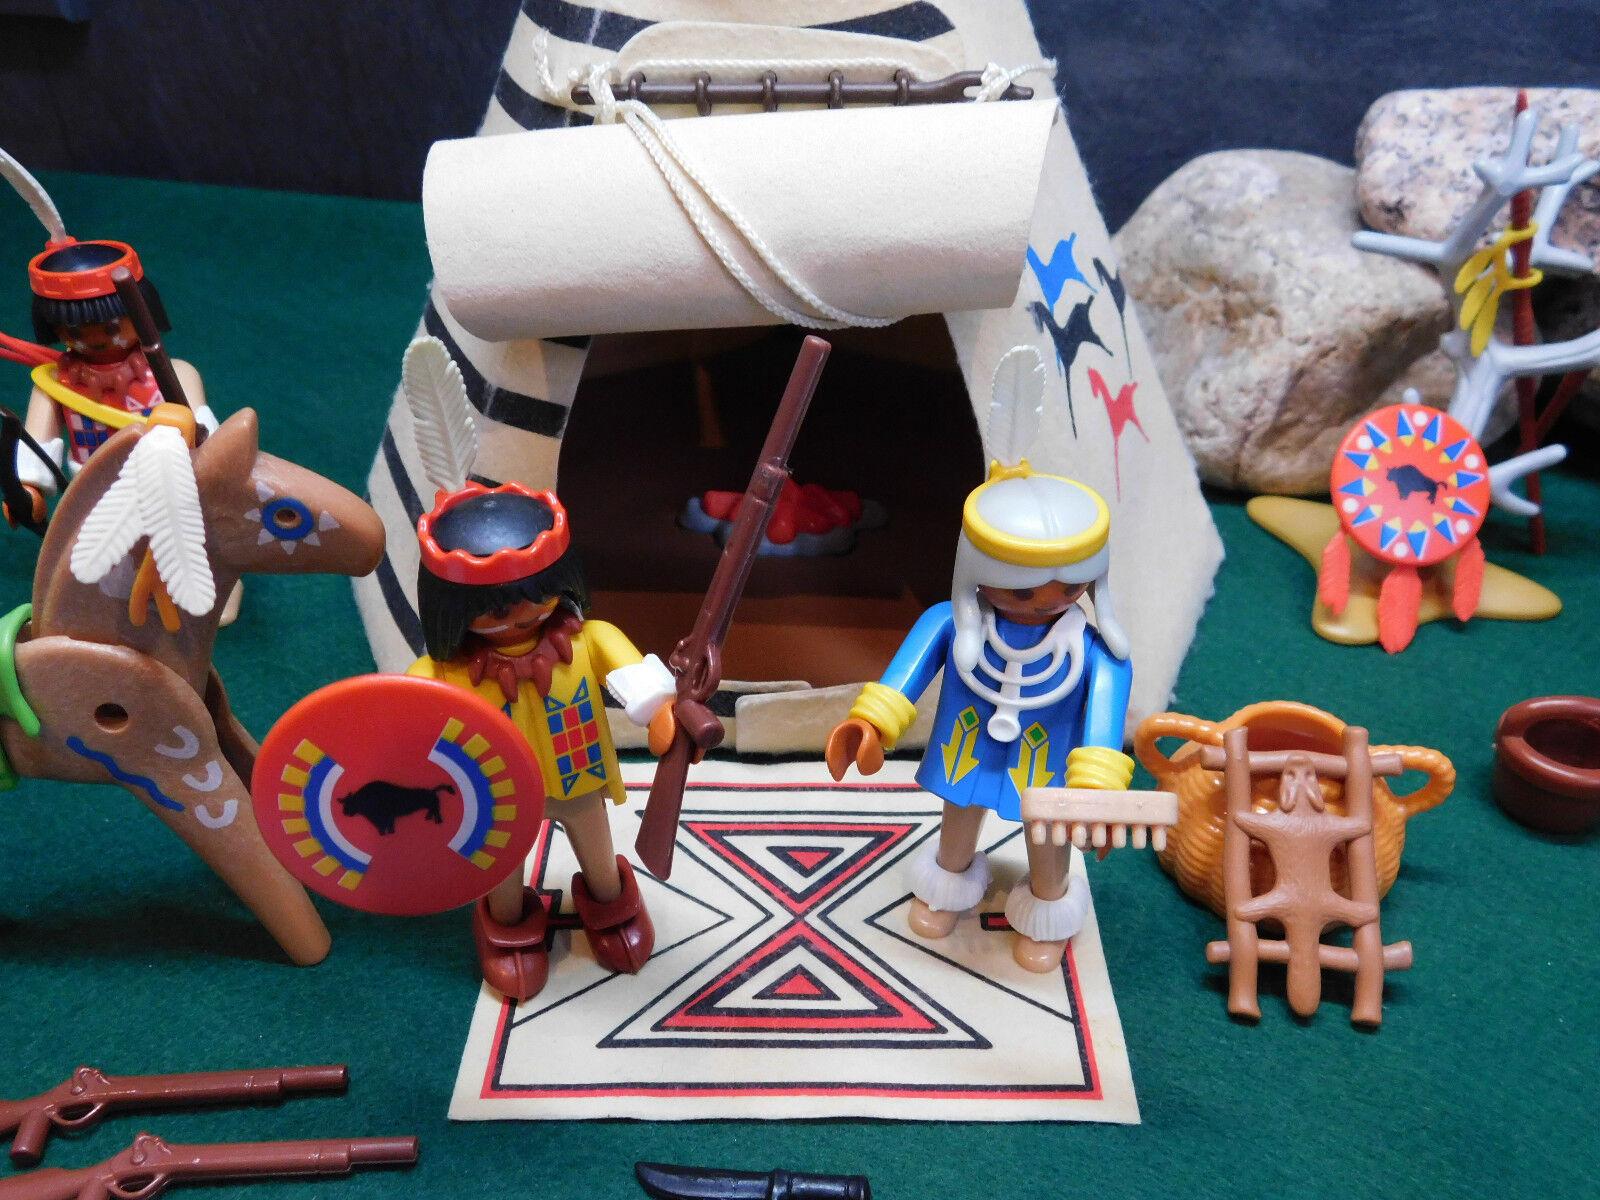 Playmobil Rarität Indianer-Sippe Tipi ähnlich 3733-A 1989 II ohne ohne ohne OVP 840f1f